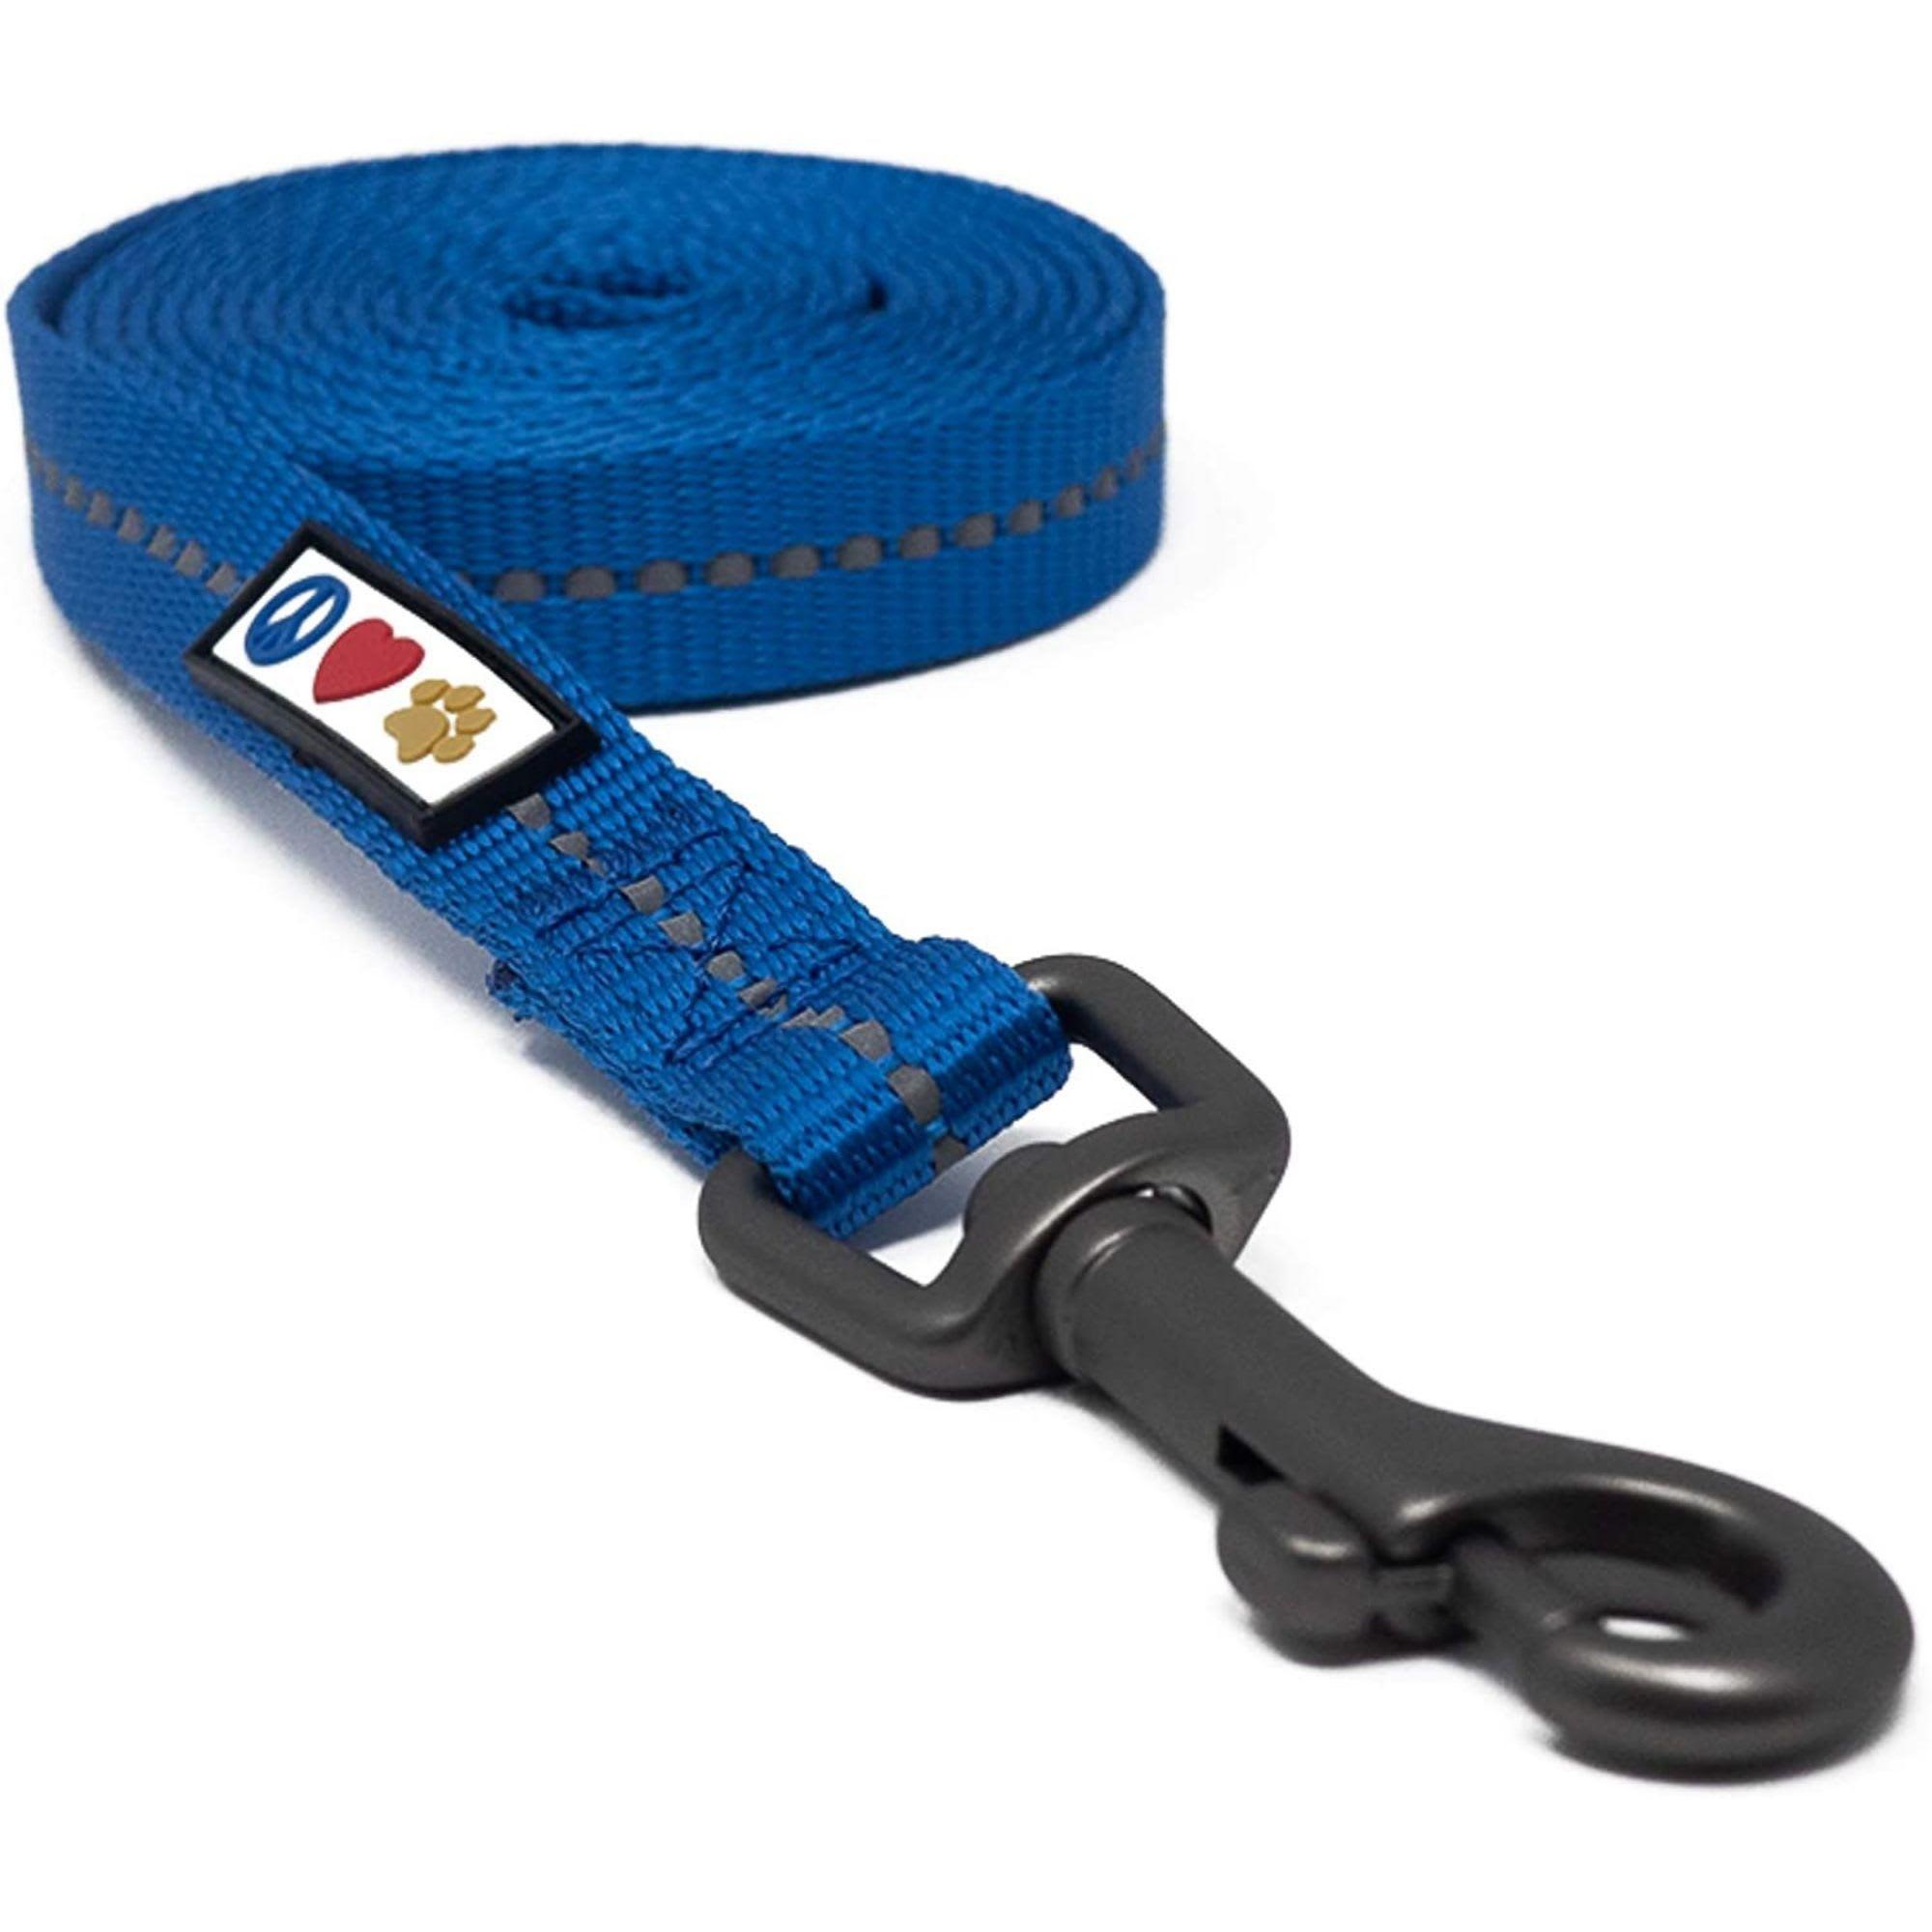 Pawtitas Blue Reflective Dog Leash, X-Small/Small | Petco